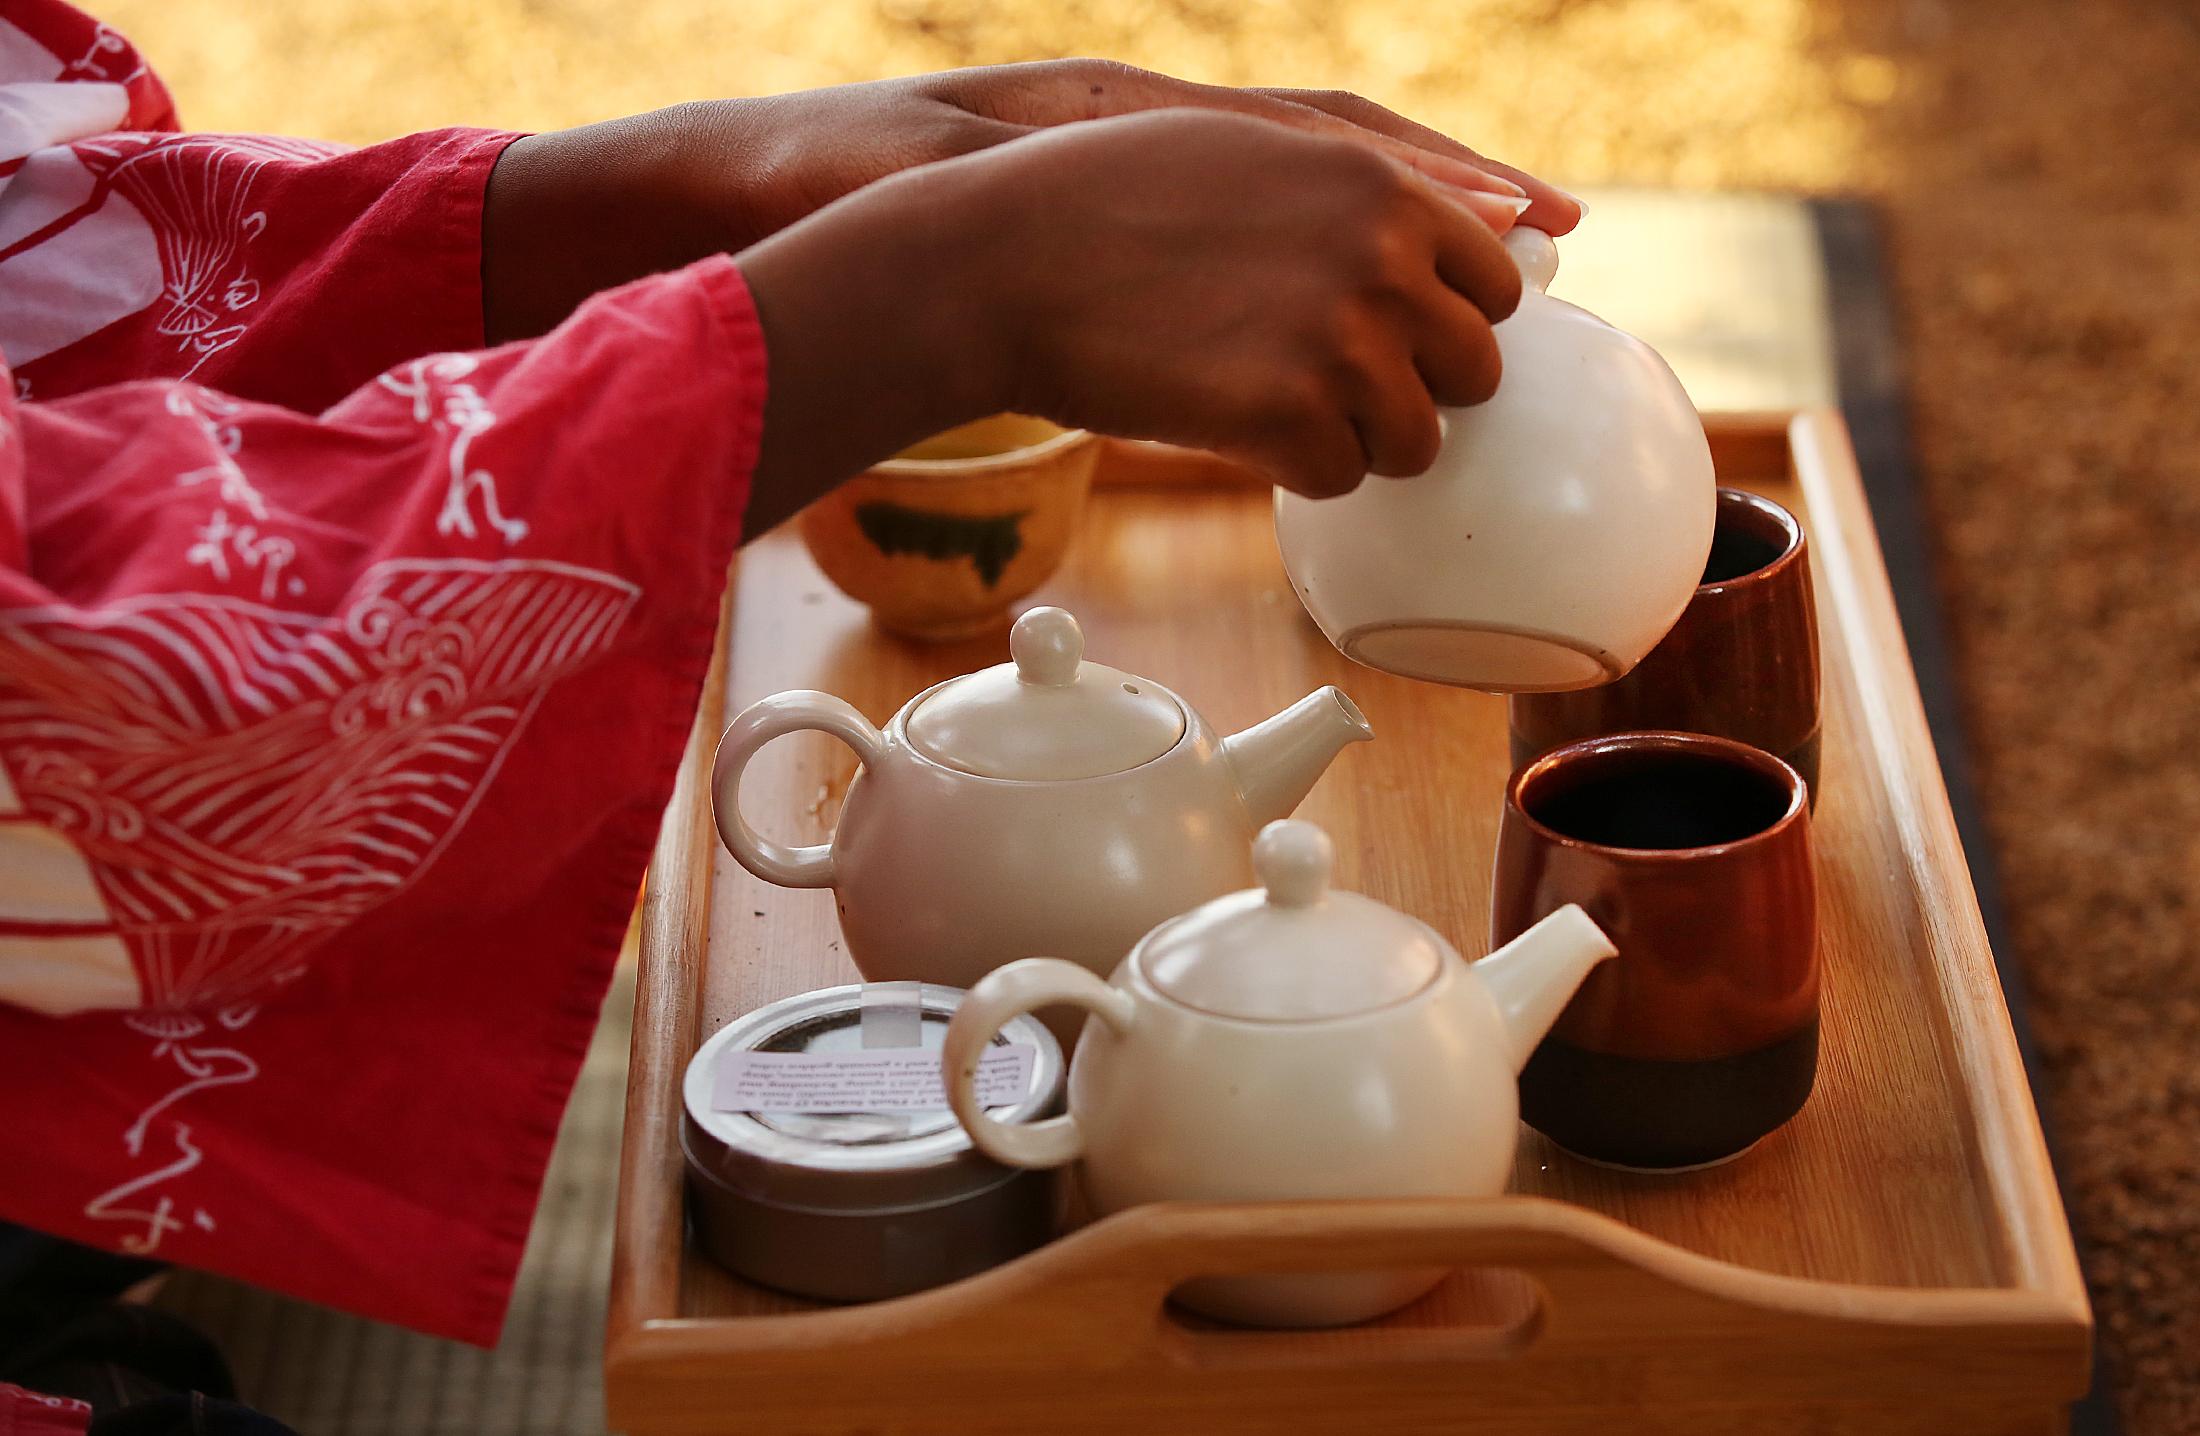 04_Teahouse_tea service_LAT.JPG